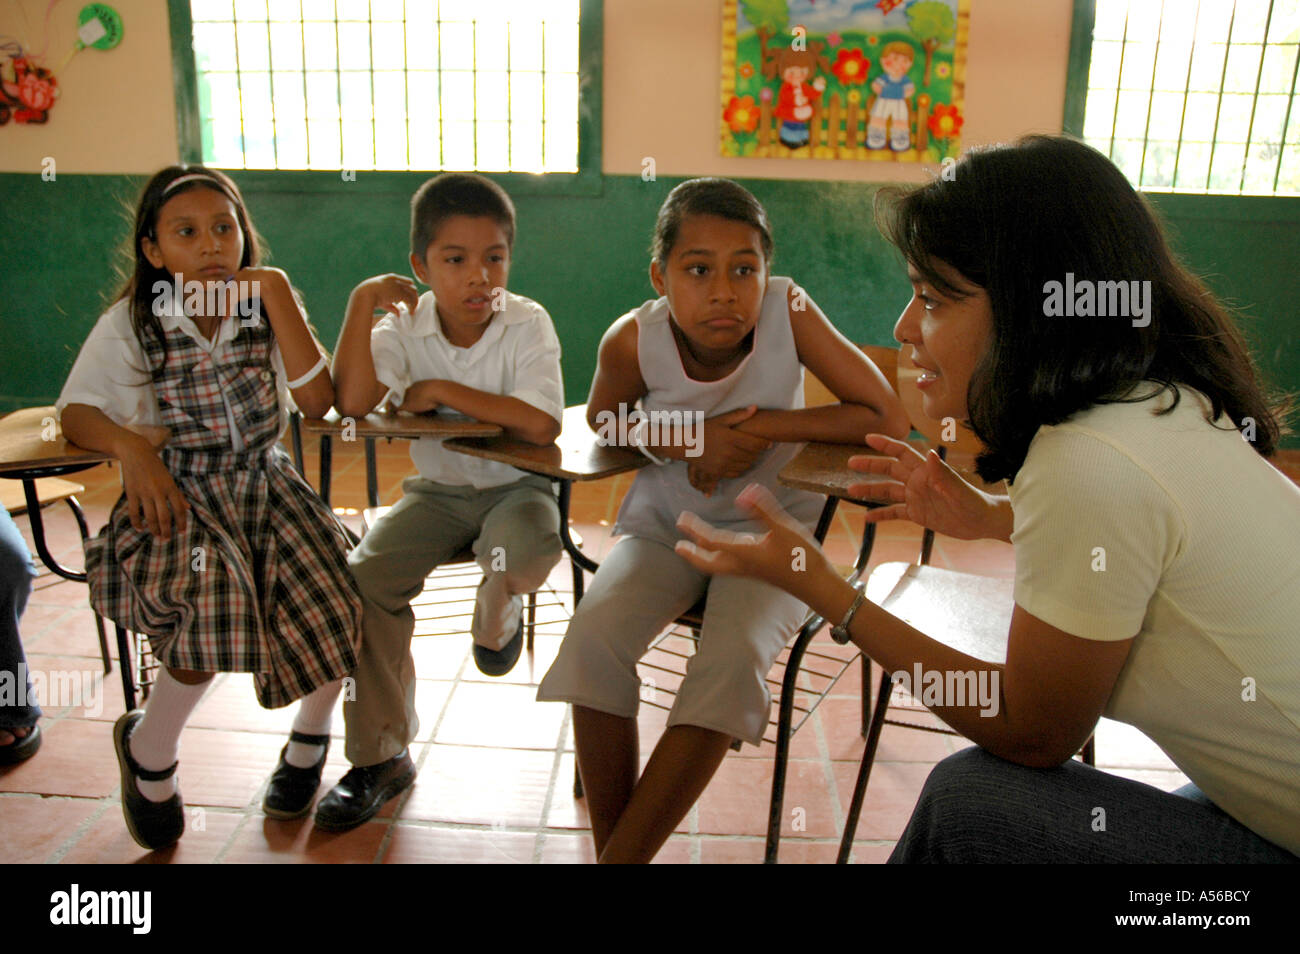 Painet iy8253 teacher colombia extracurricular seminar middle school paz barrancabermeja children kids discuss violence - Stock Image